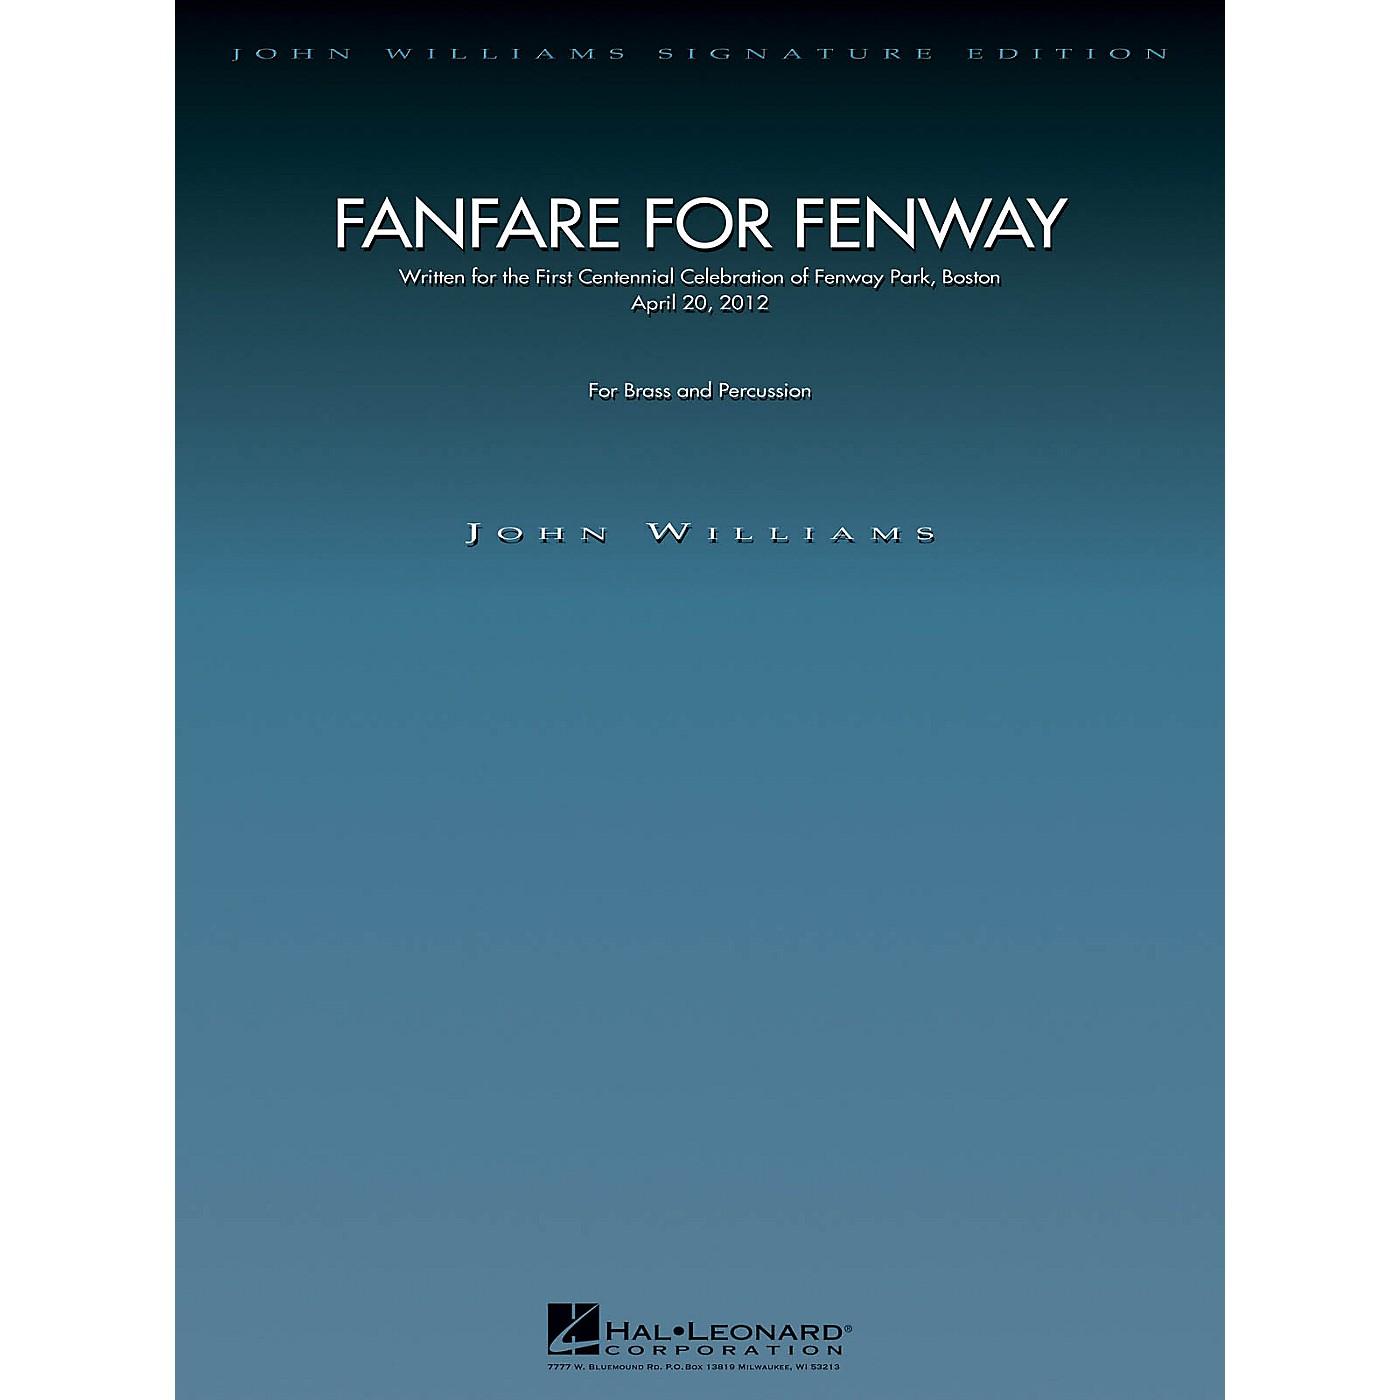 Hal Leonard Fanfare for Fenway John Williams Signature Edition - Brass Series by John Williams thumbnail